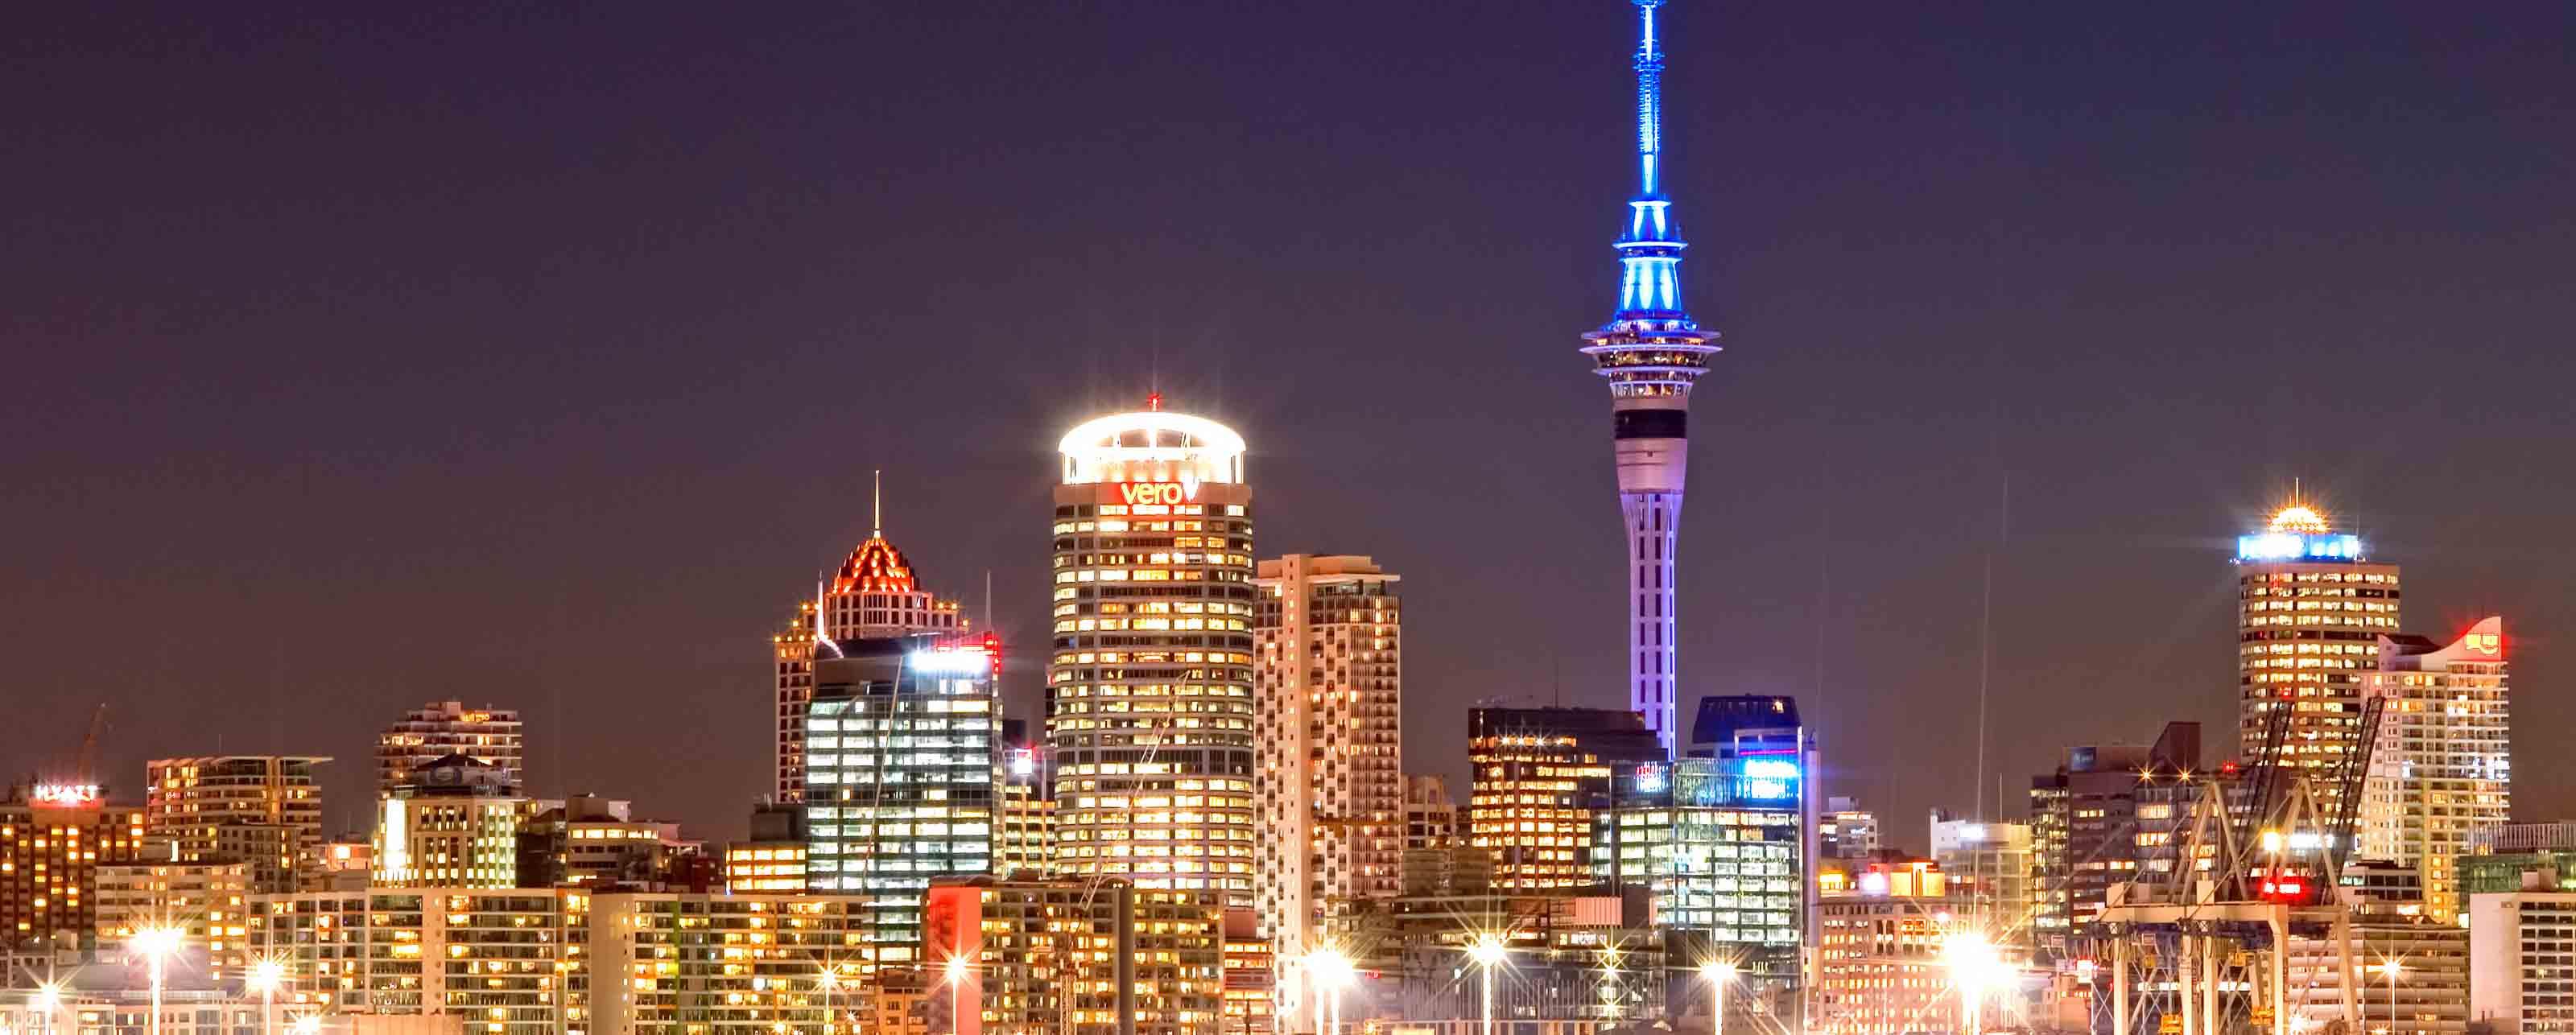 Chorus New Zealand Telecom uses GE software to keep the network performingChorus New Zealand Telecom uses GE software to keep the network performing